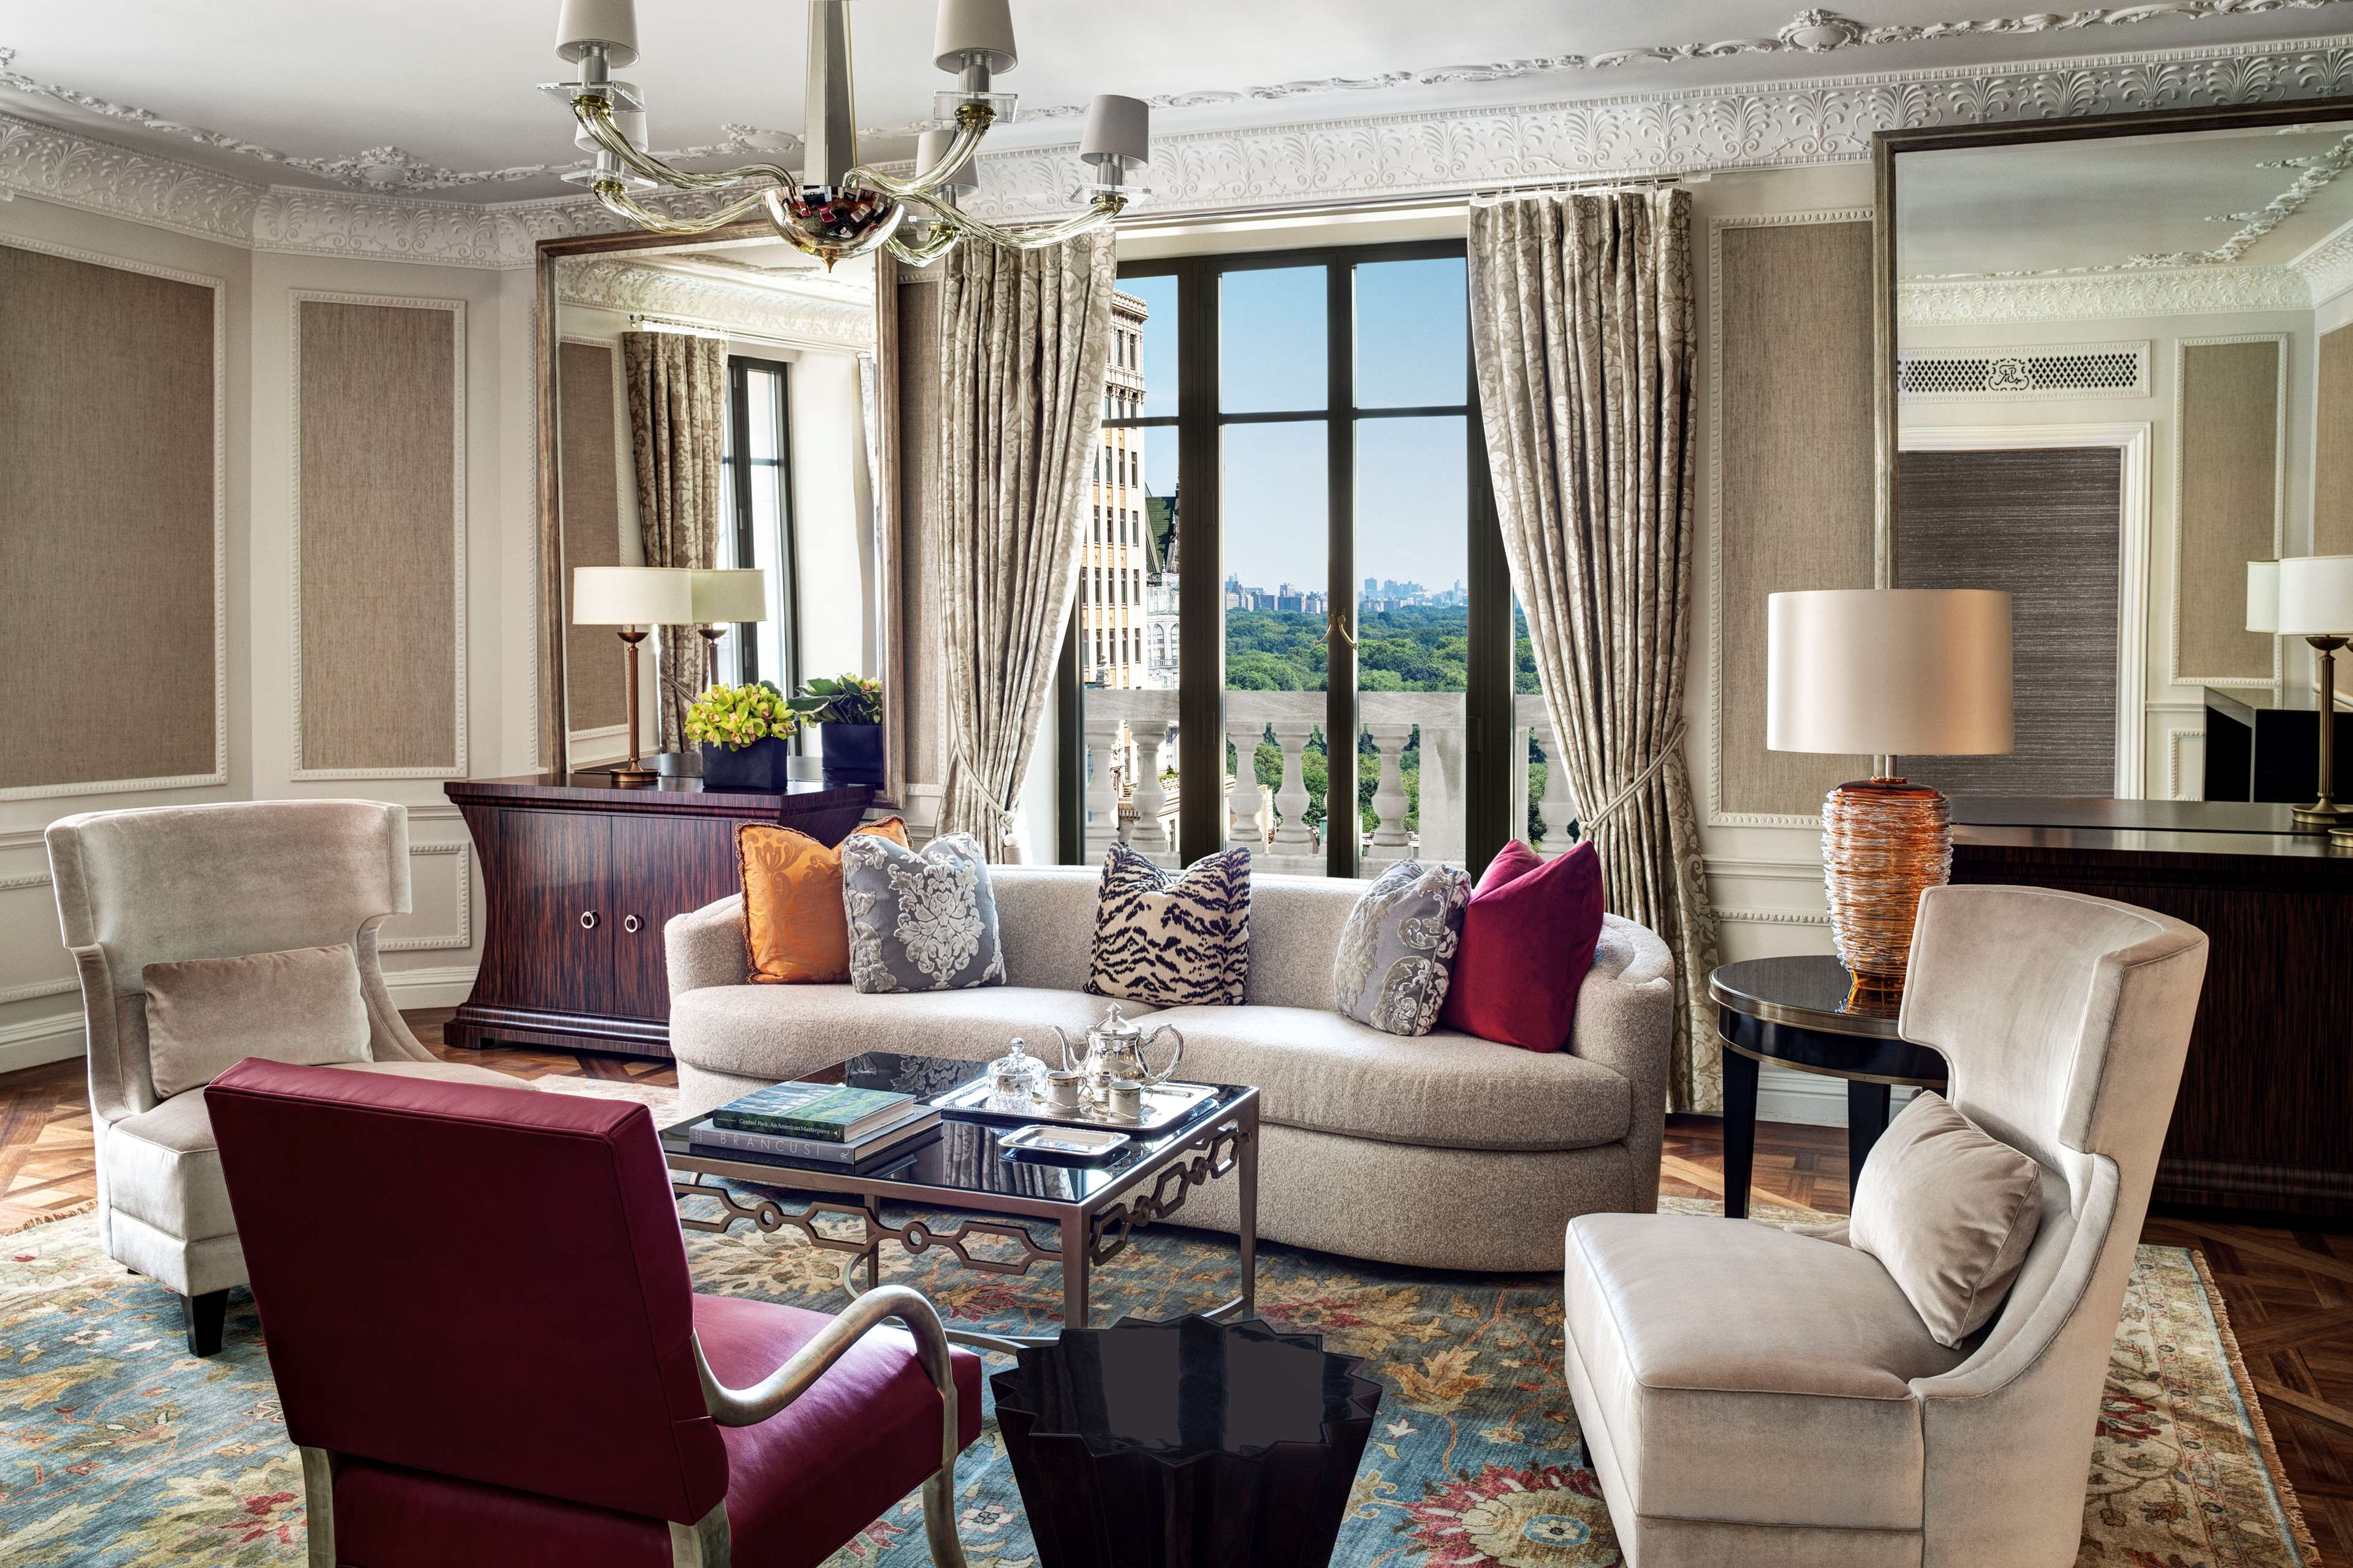 duurste-hotelkamers-new-york-femfem